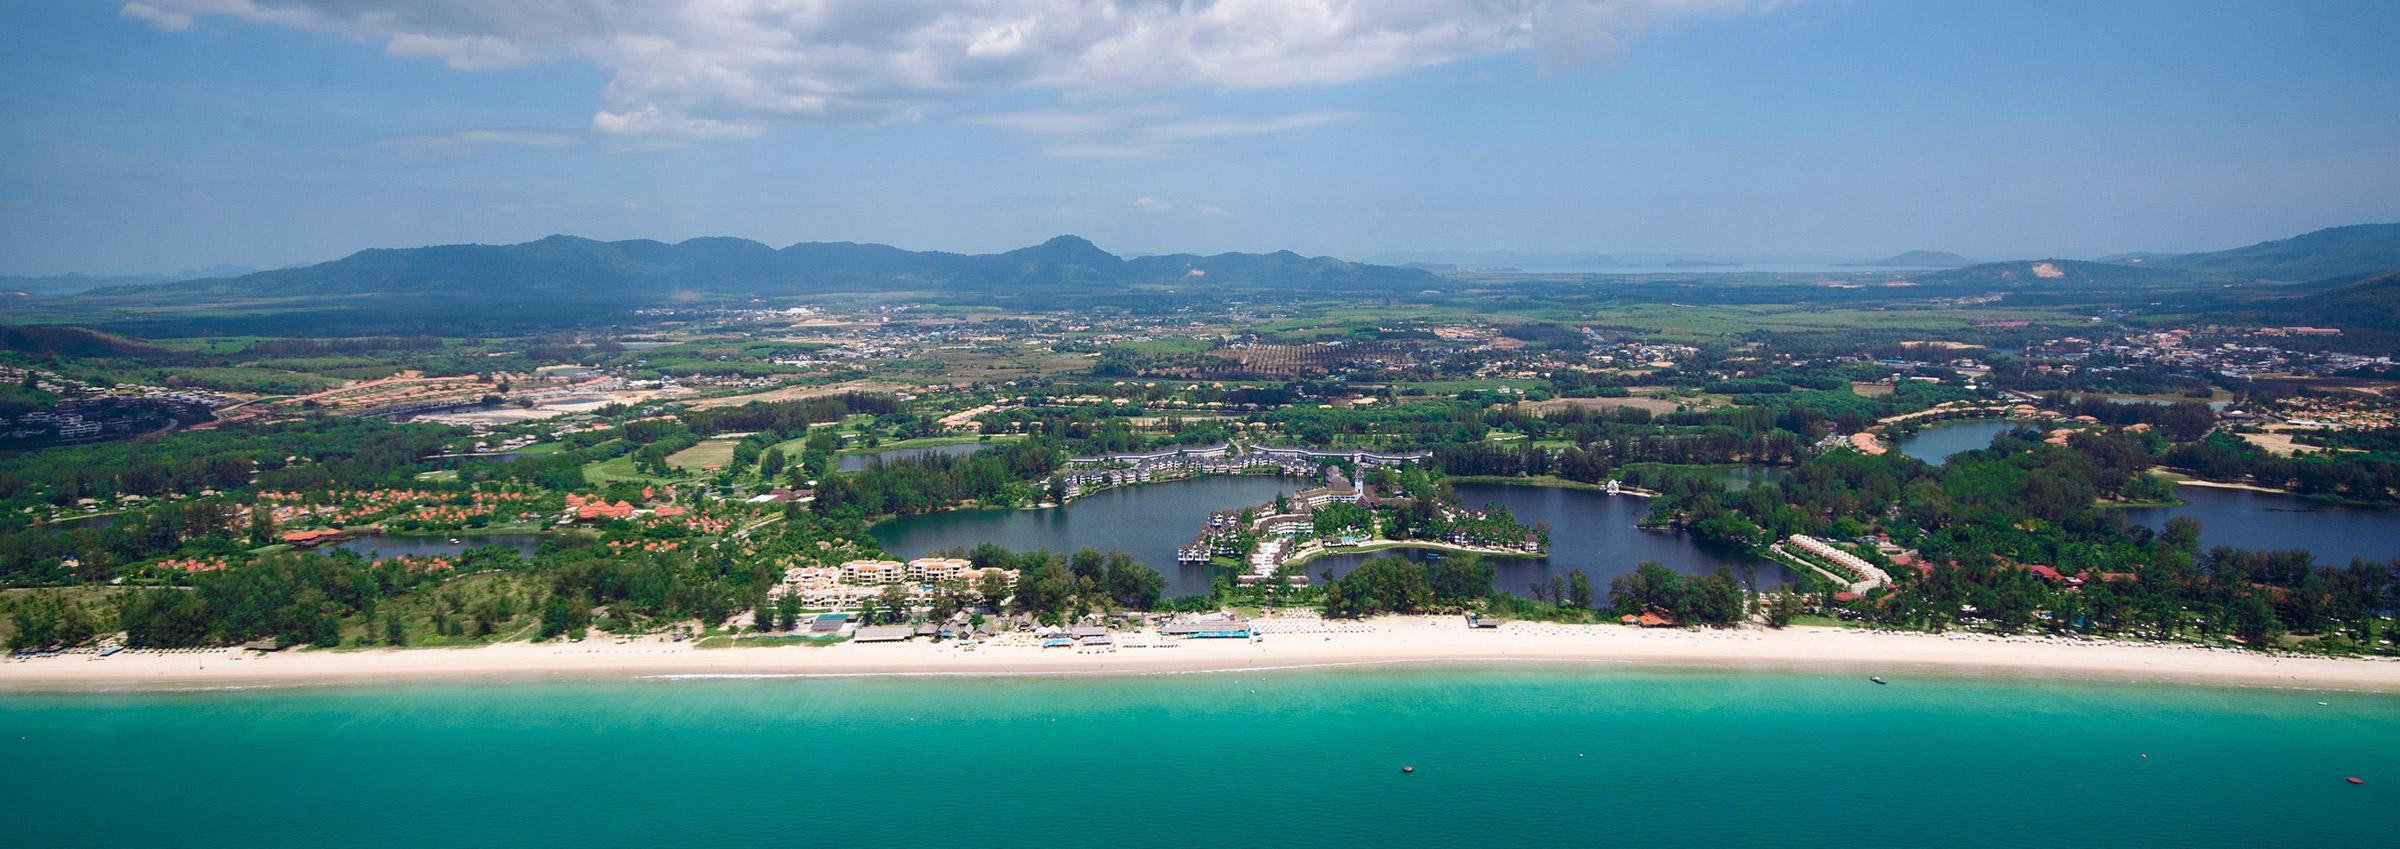 Laguna Phuket Overview